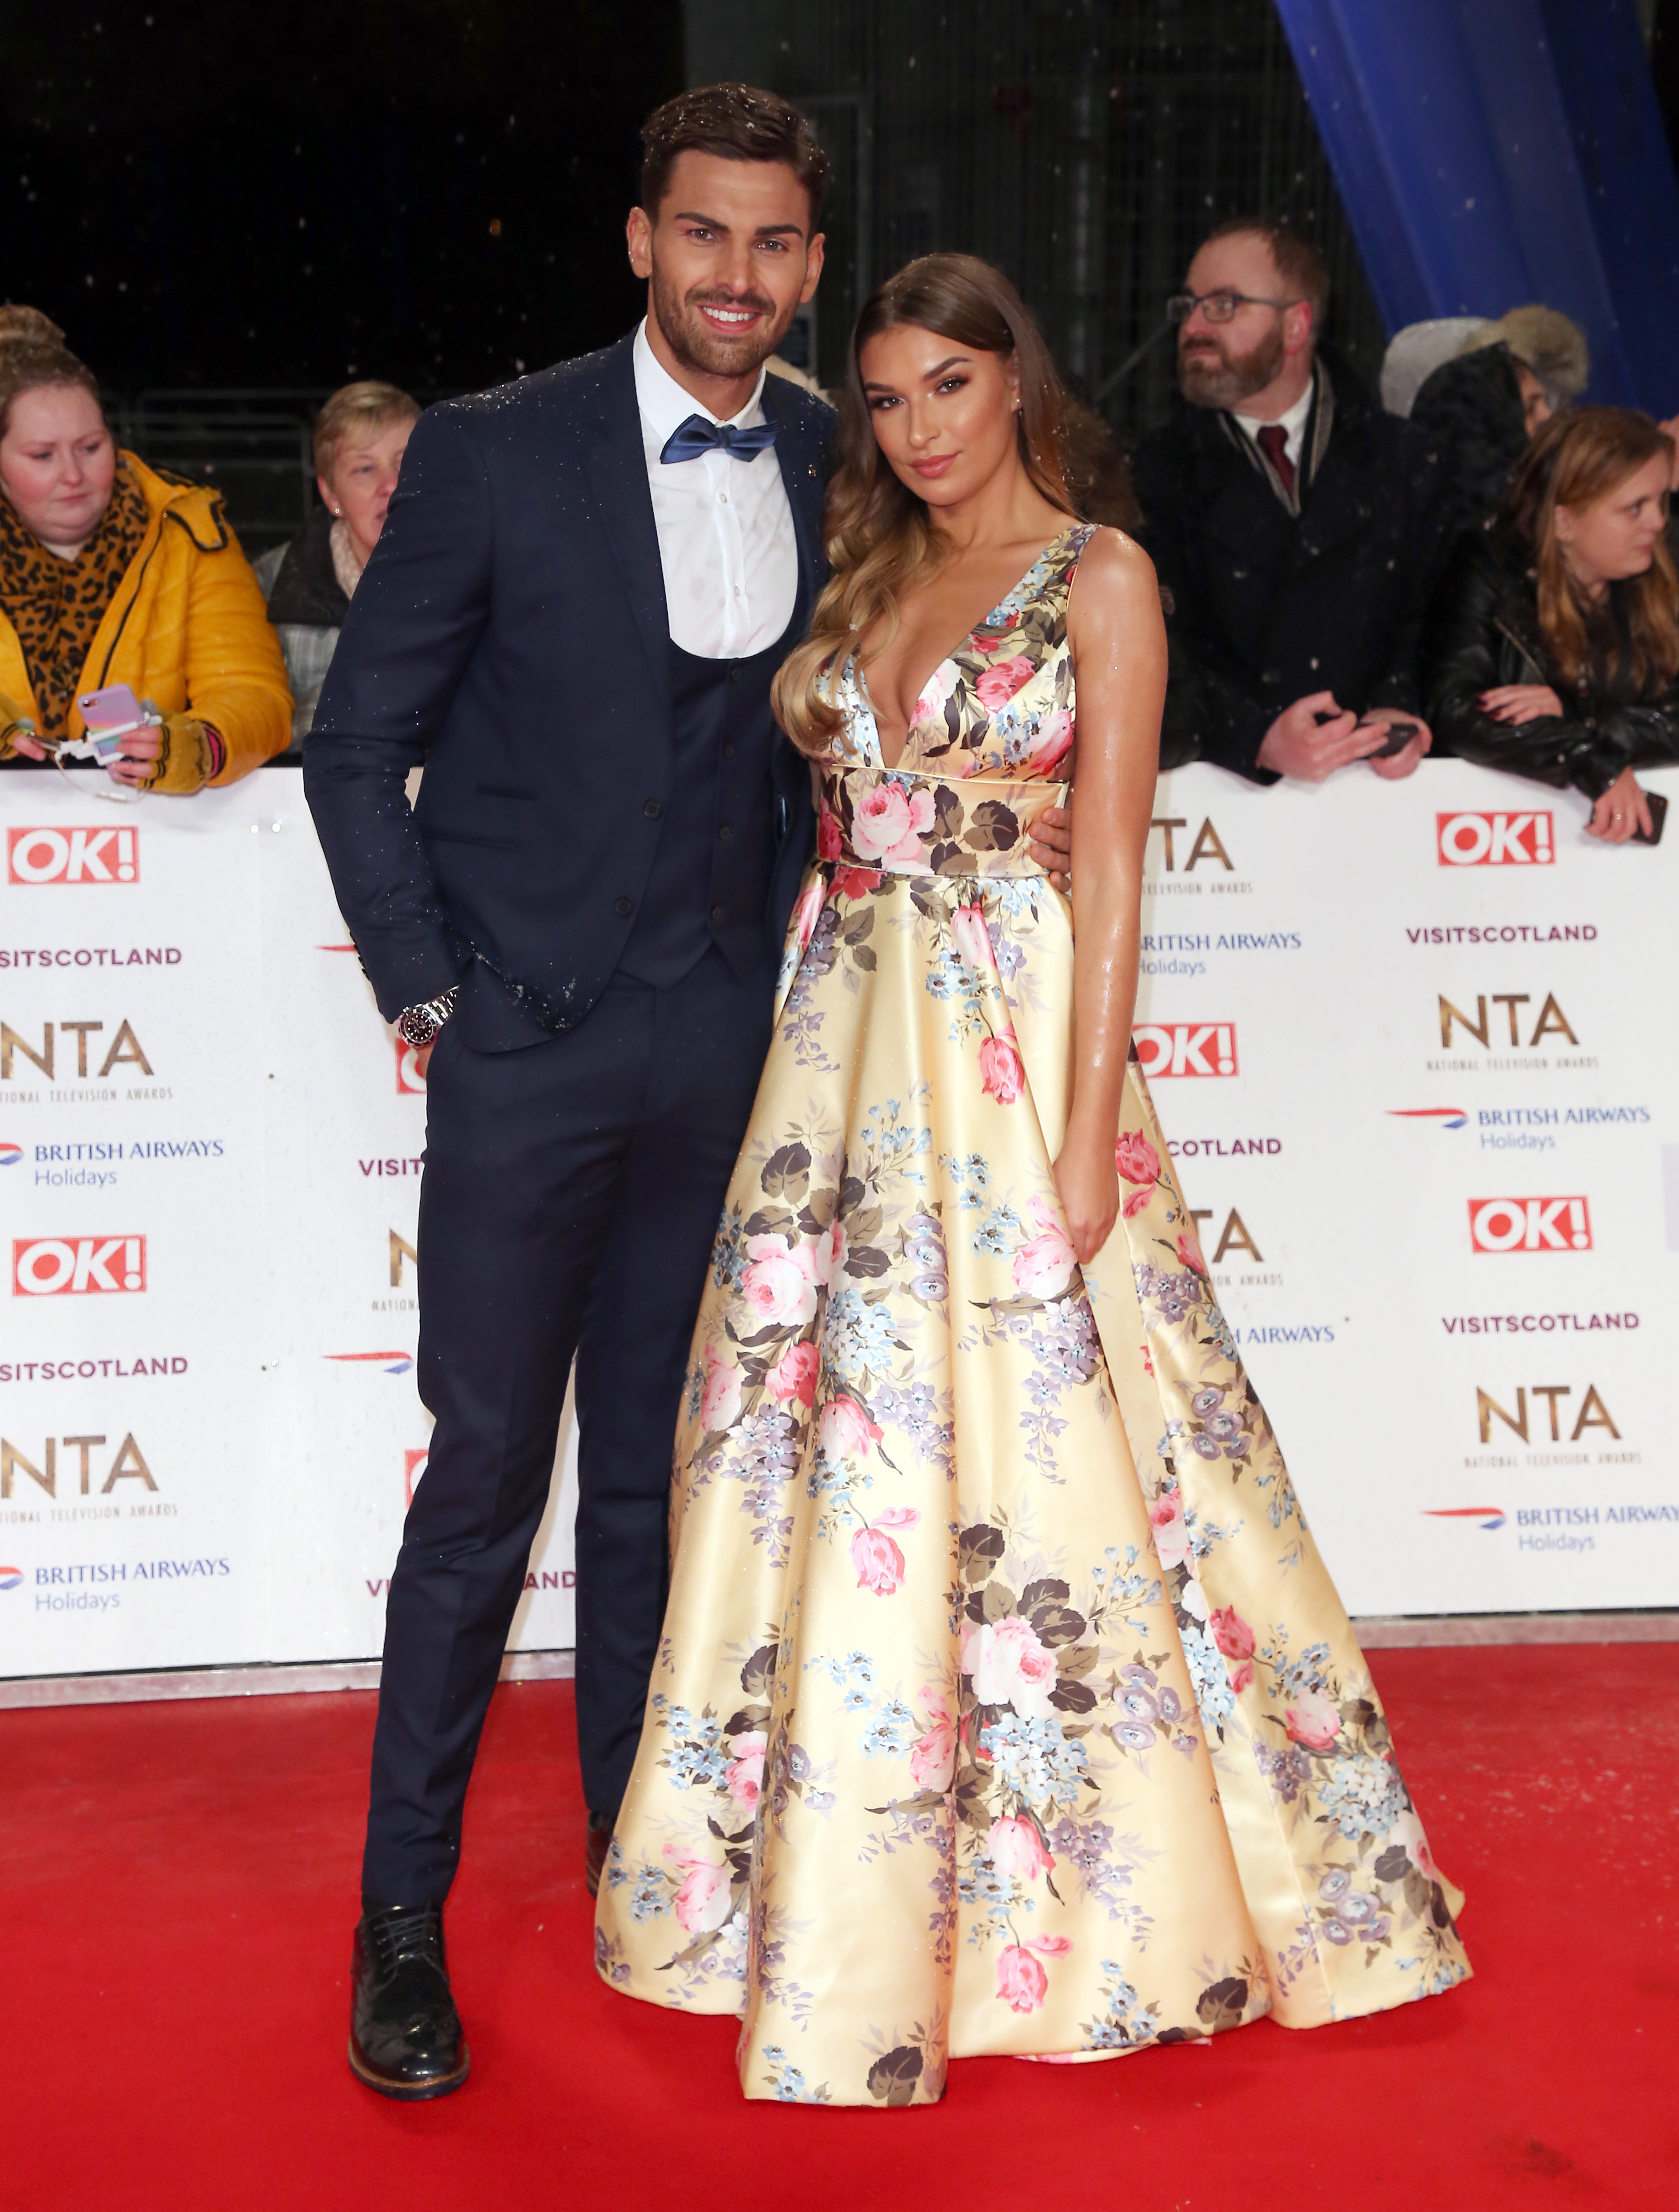 Adam Collard and Zara McDermott at The National Television Awards 2019